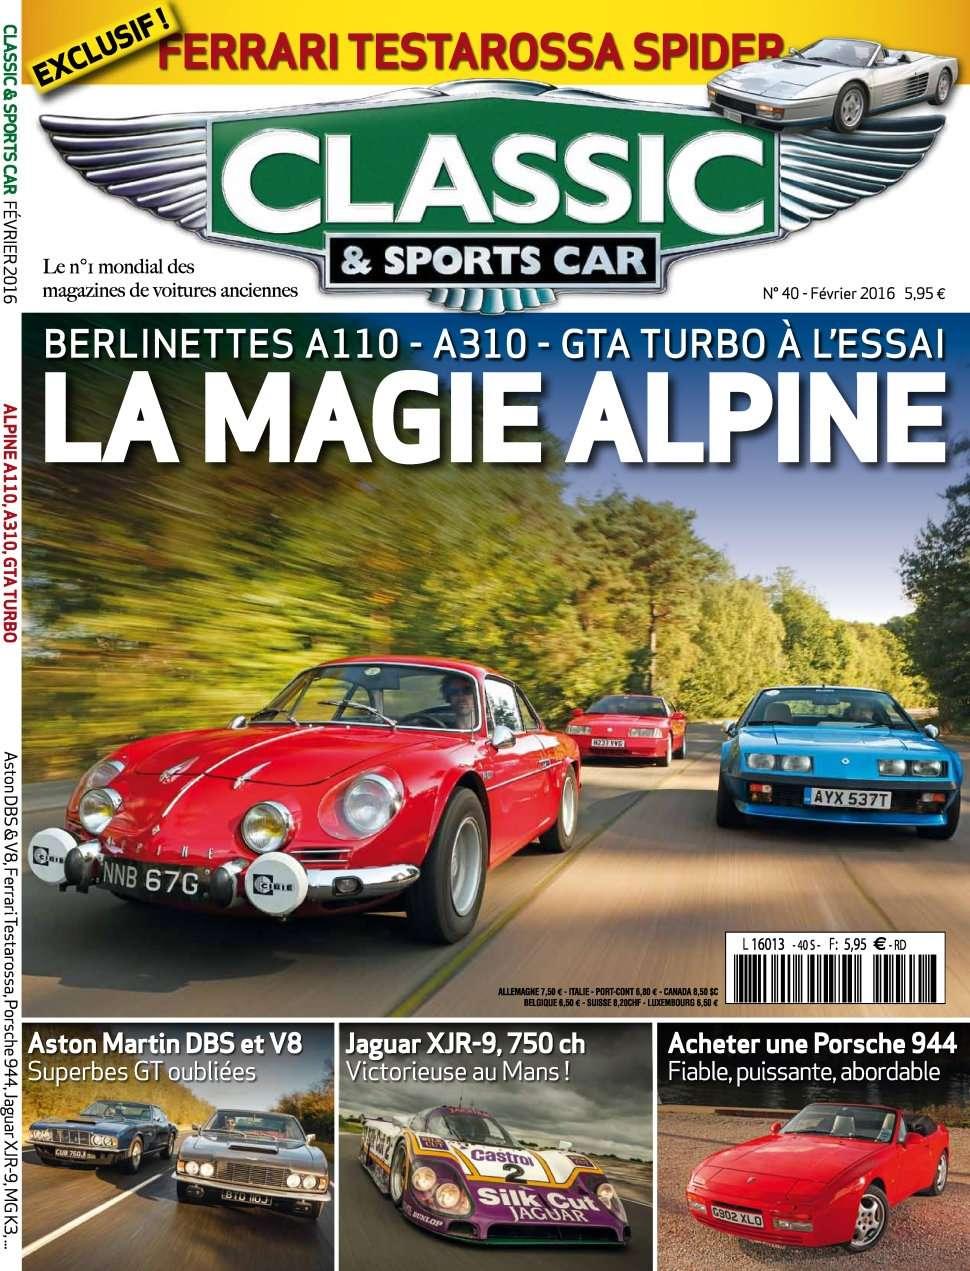 Classic & Sports Car 40 - Février 2016